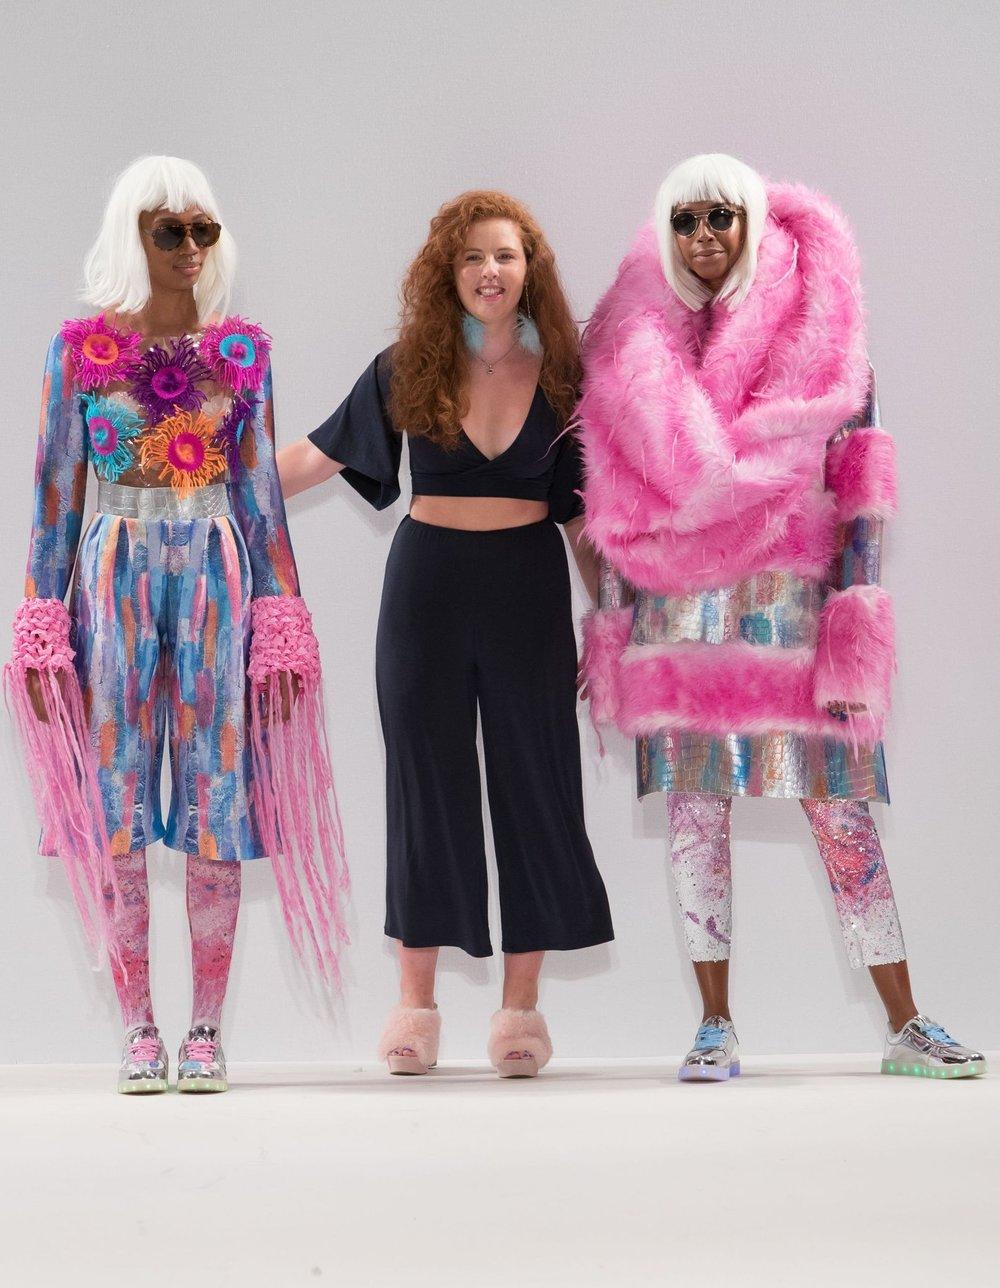 Billie Jacobina - Fashion Designer